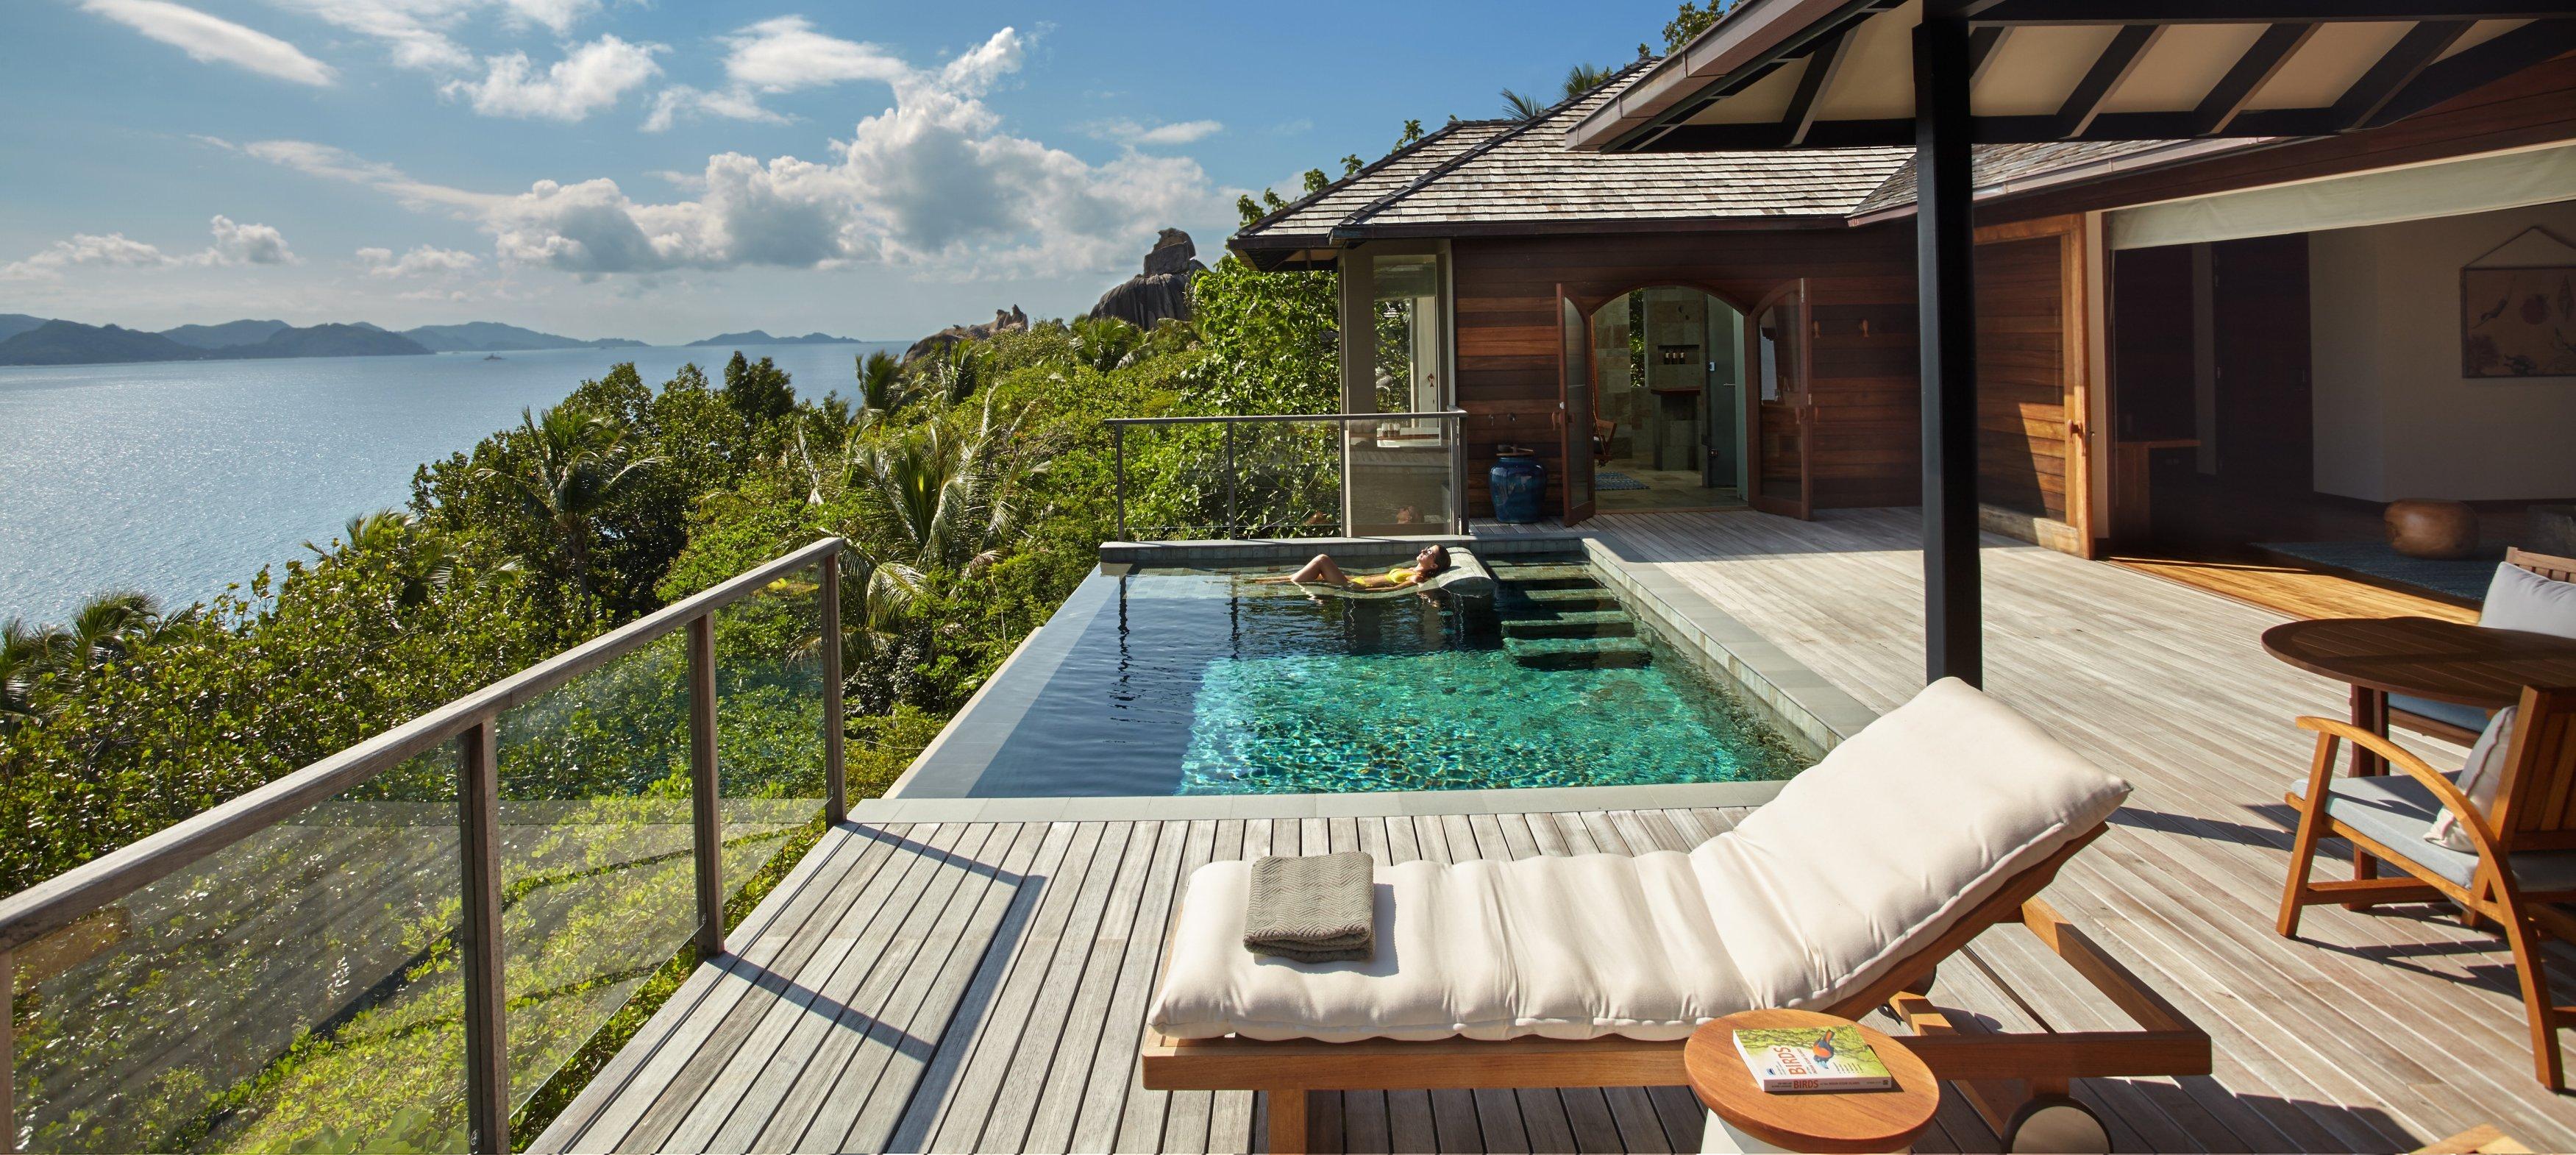 luxury-private-island-honeymoon